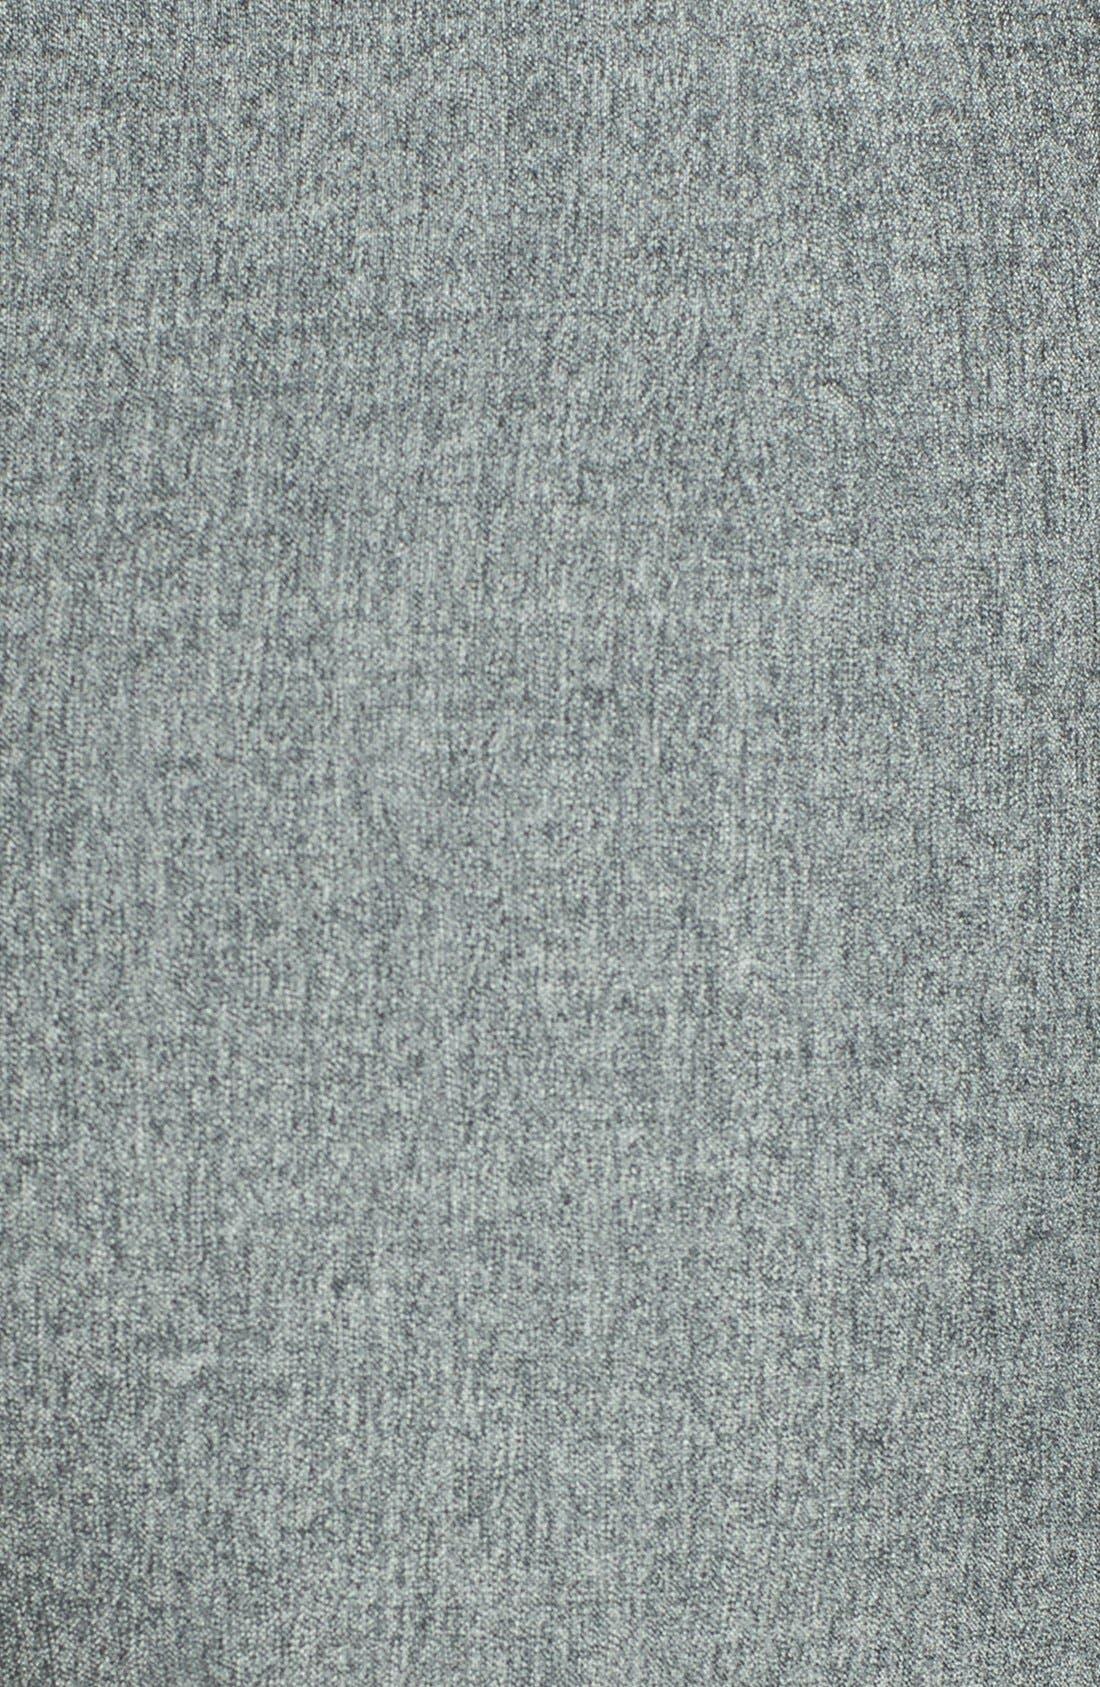 Alternate Image 3  - Santorelli Straight Leg Stretch Wool Suiting Pants